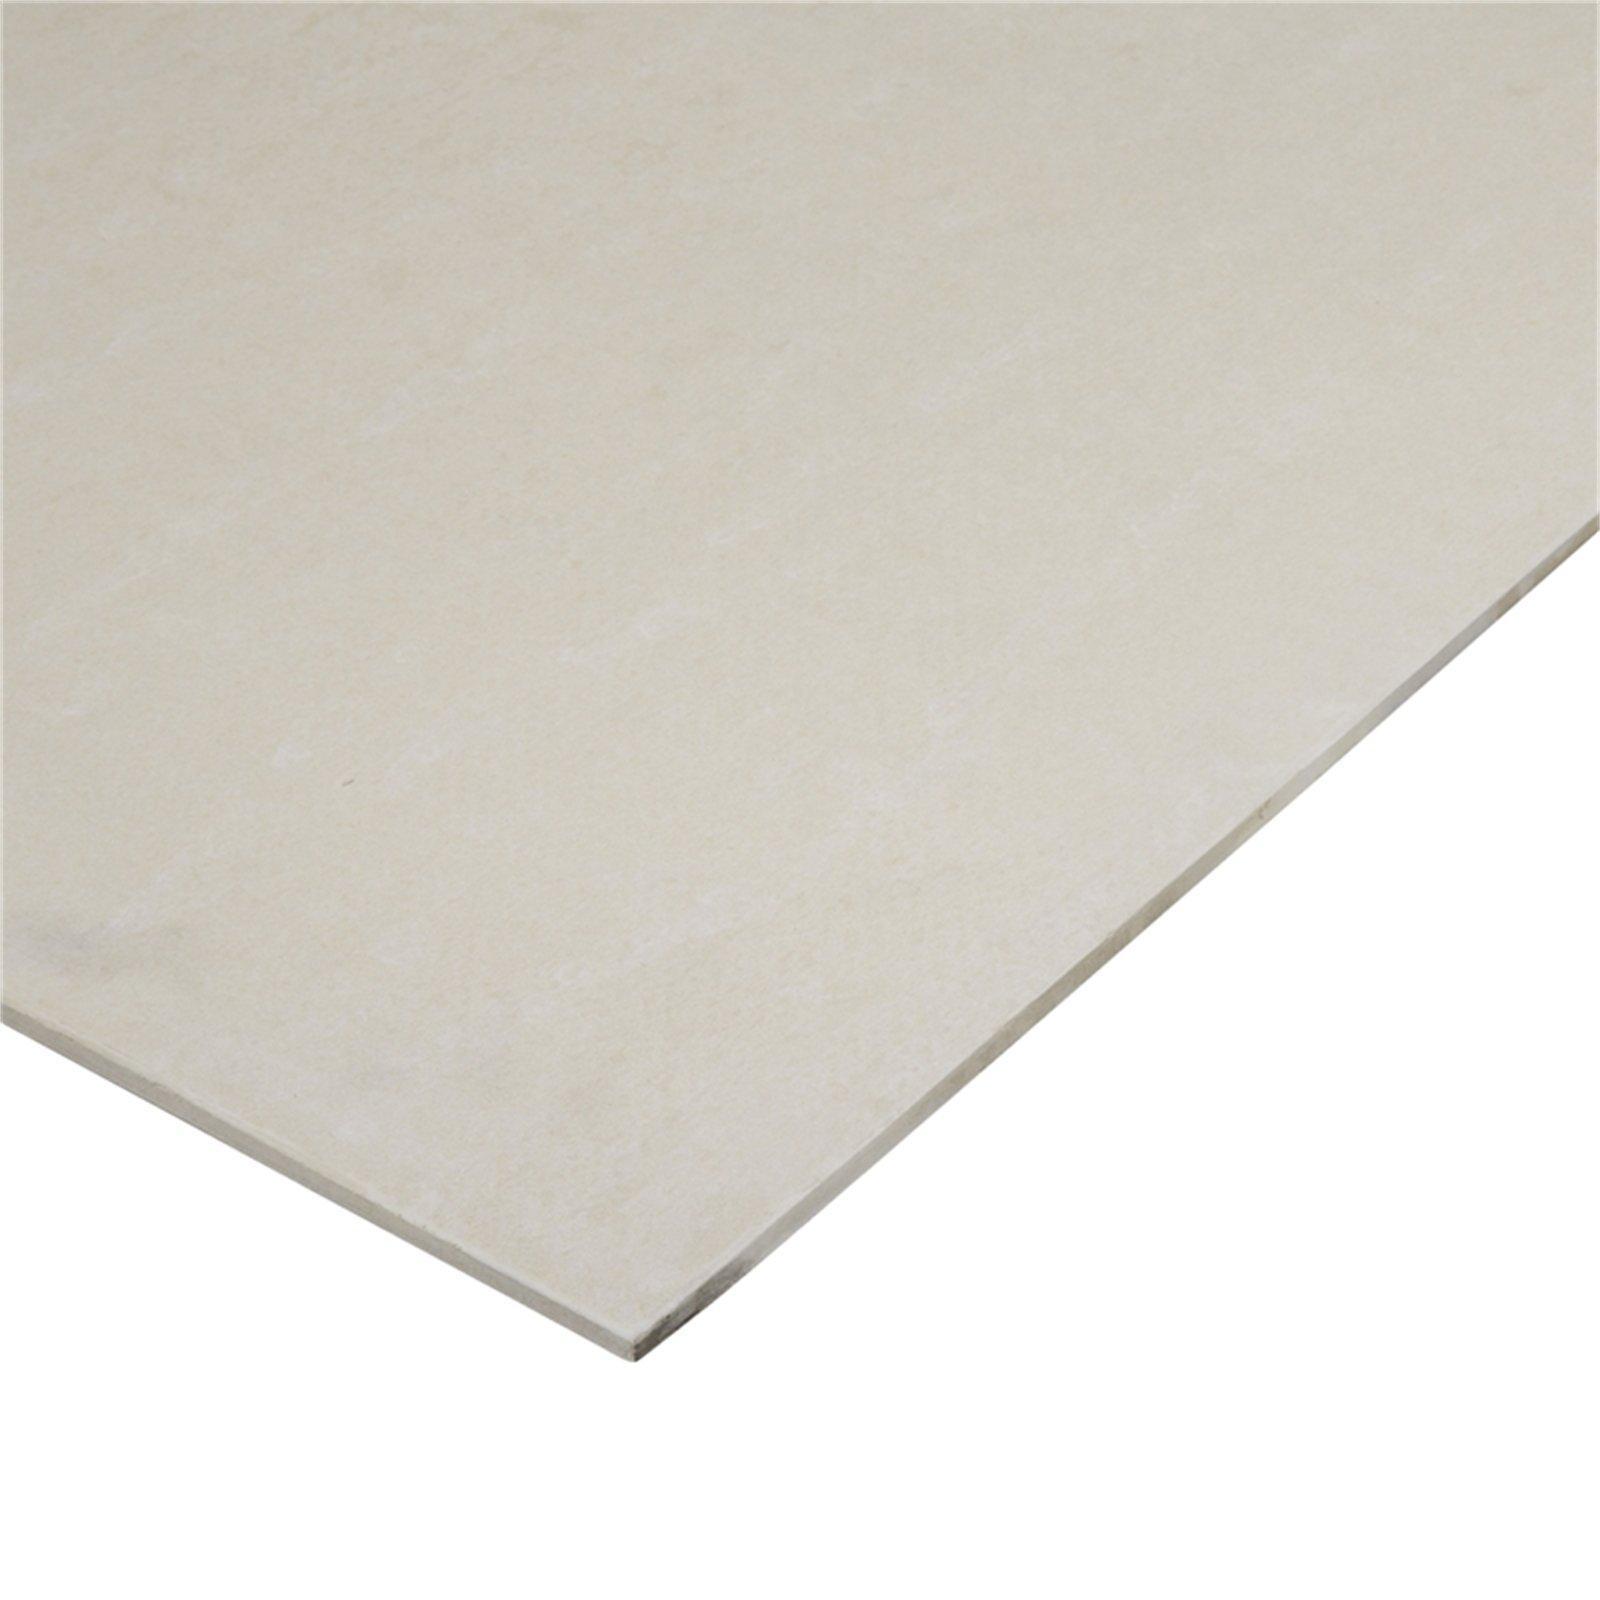 Primaflex 2400 x 600 x 4.5mm Cement Panel